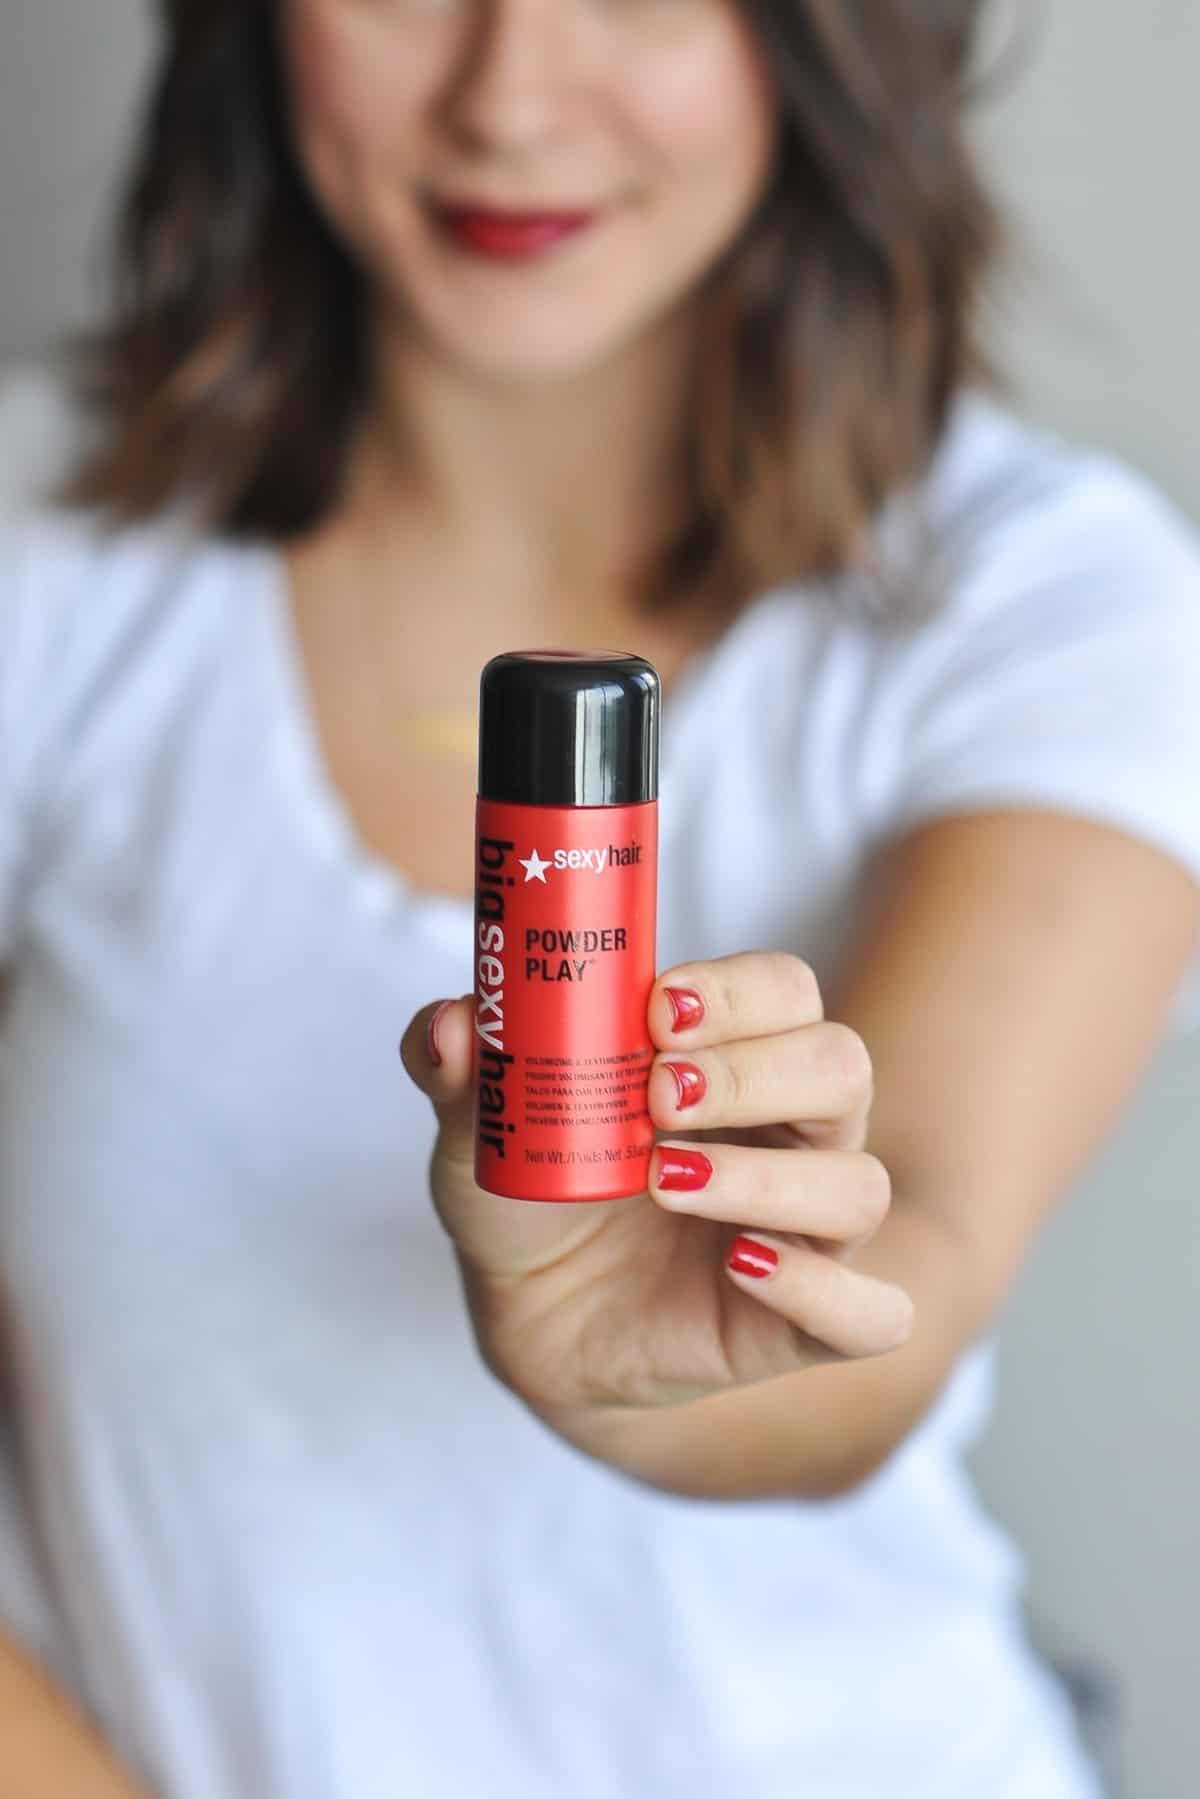 volumizing texture sprays and powders